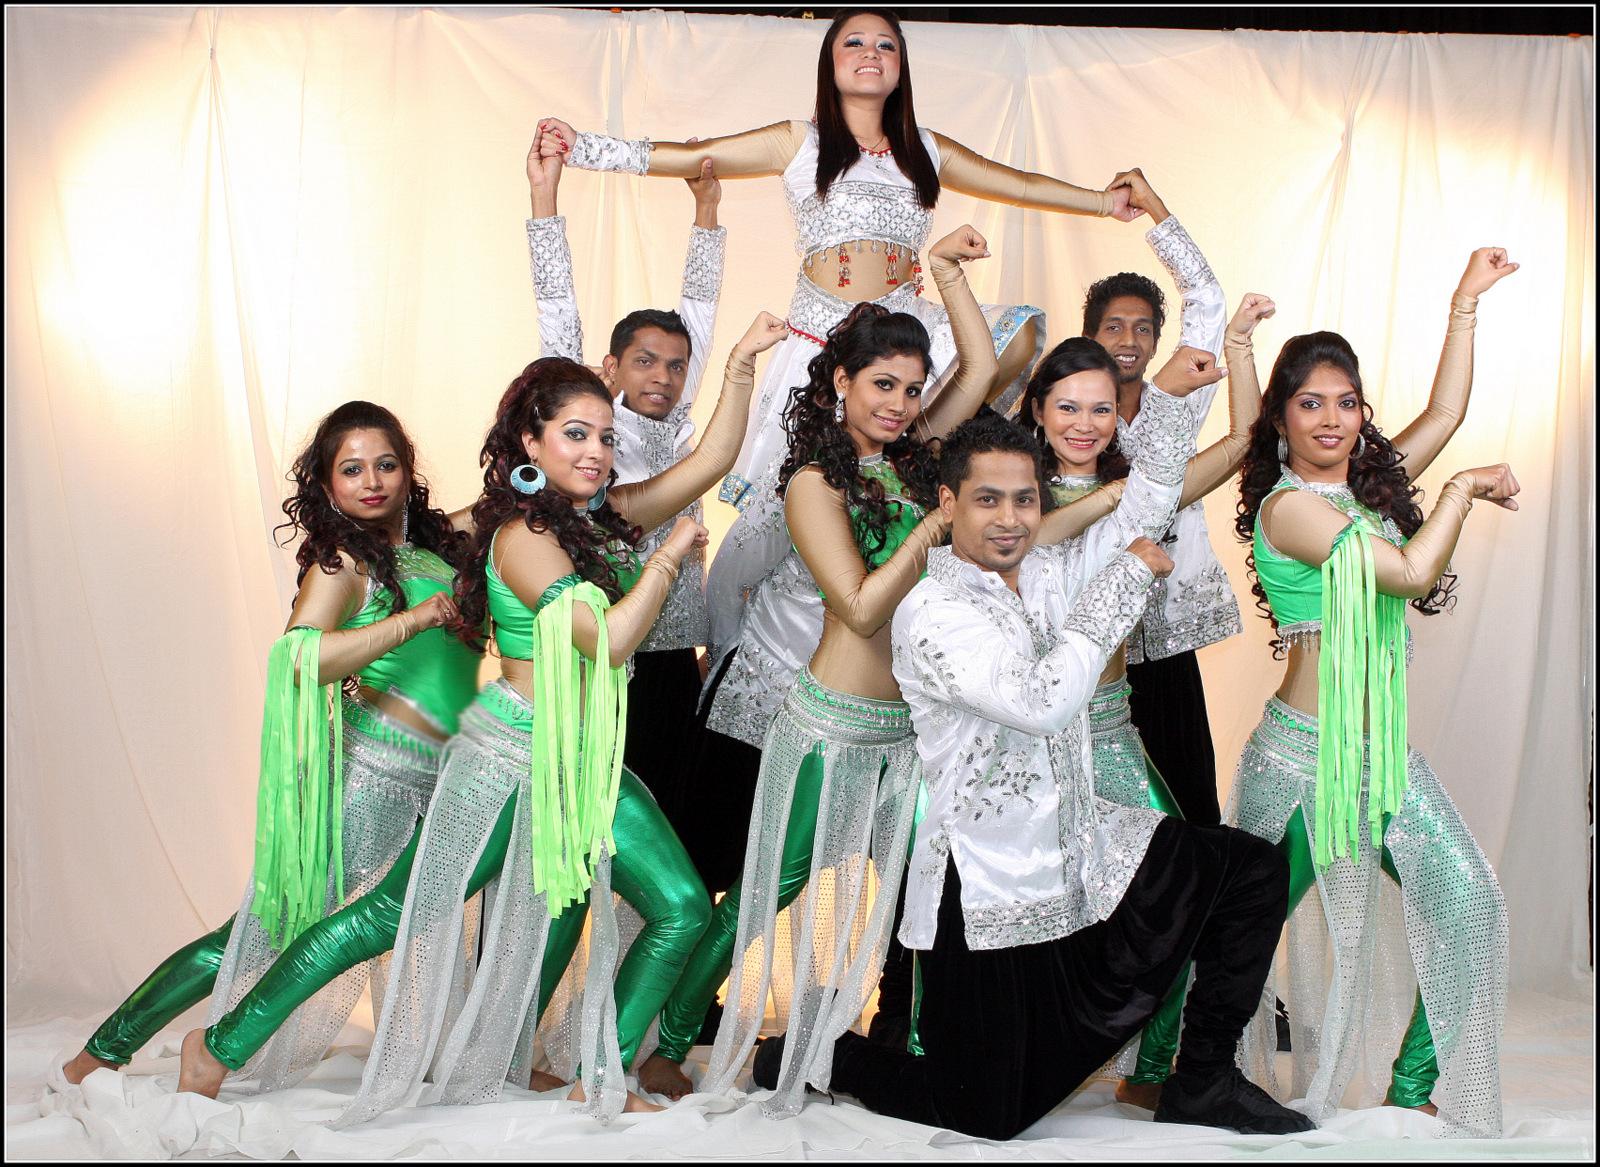 Professional dancer for music videos in dubai